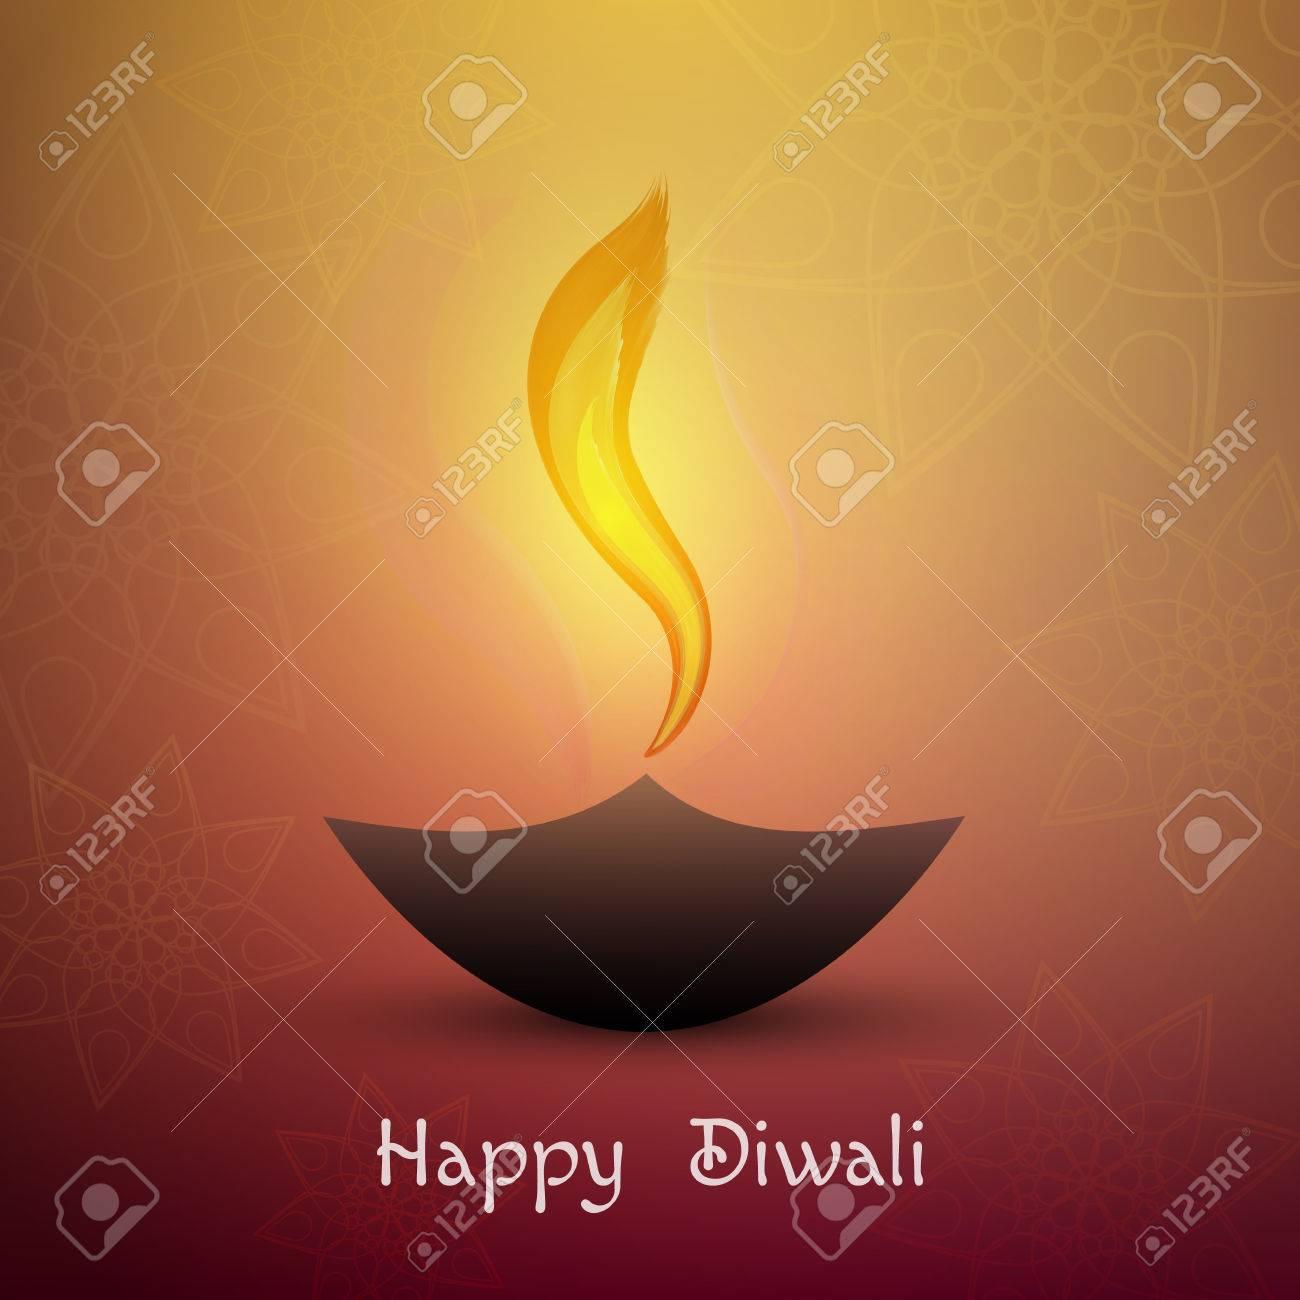 Happy diwali beautiful greeting card for festival diwali royalty happy diwali beautiful greeting card for festival diwali stock vector 65226137 m4hsunfo